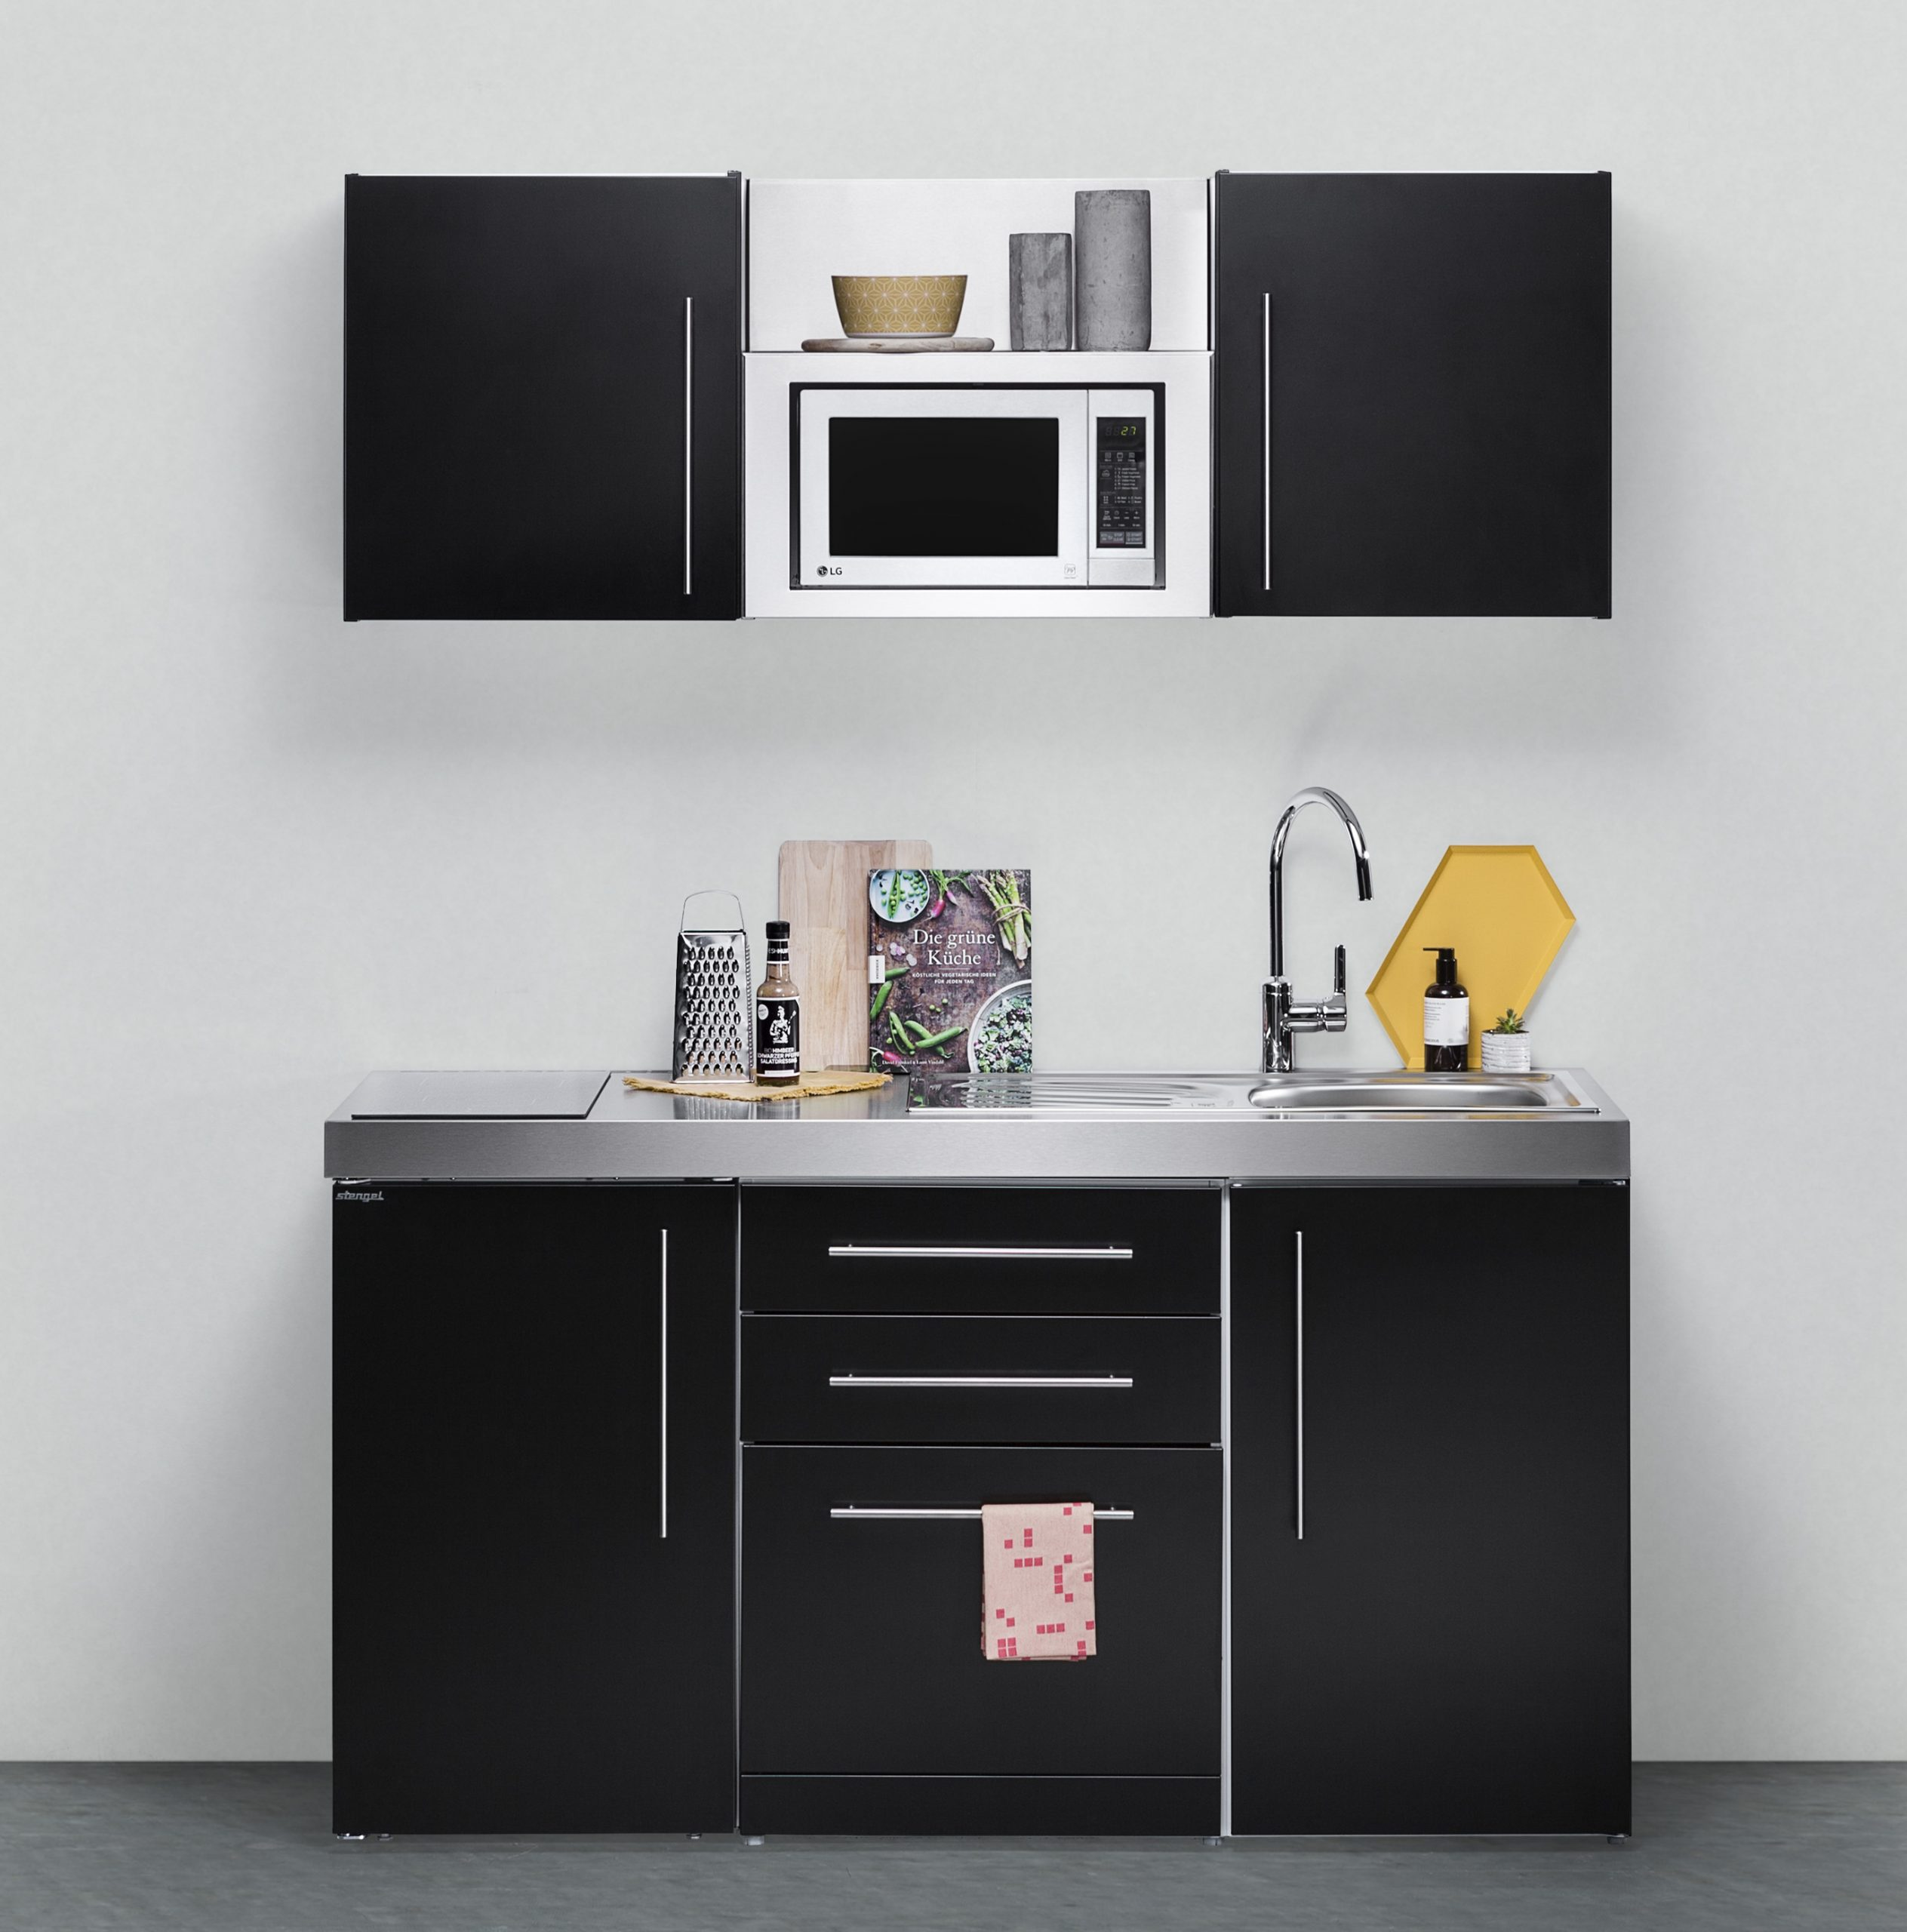 Full Size of Mini Küche Zum Spielen Mini Küche Zum Echt Kochen Smoby Tefal Mini Küche Japanische Mini Küche Küche Mini Küche